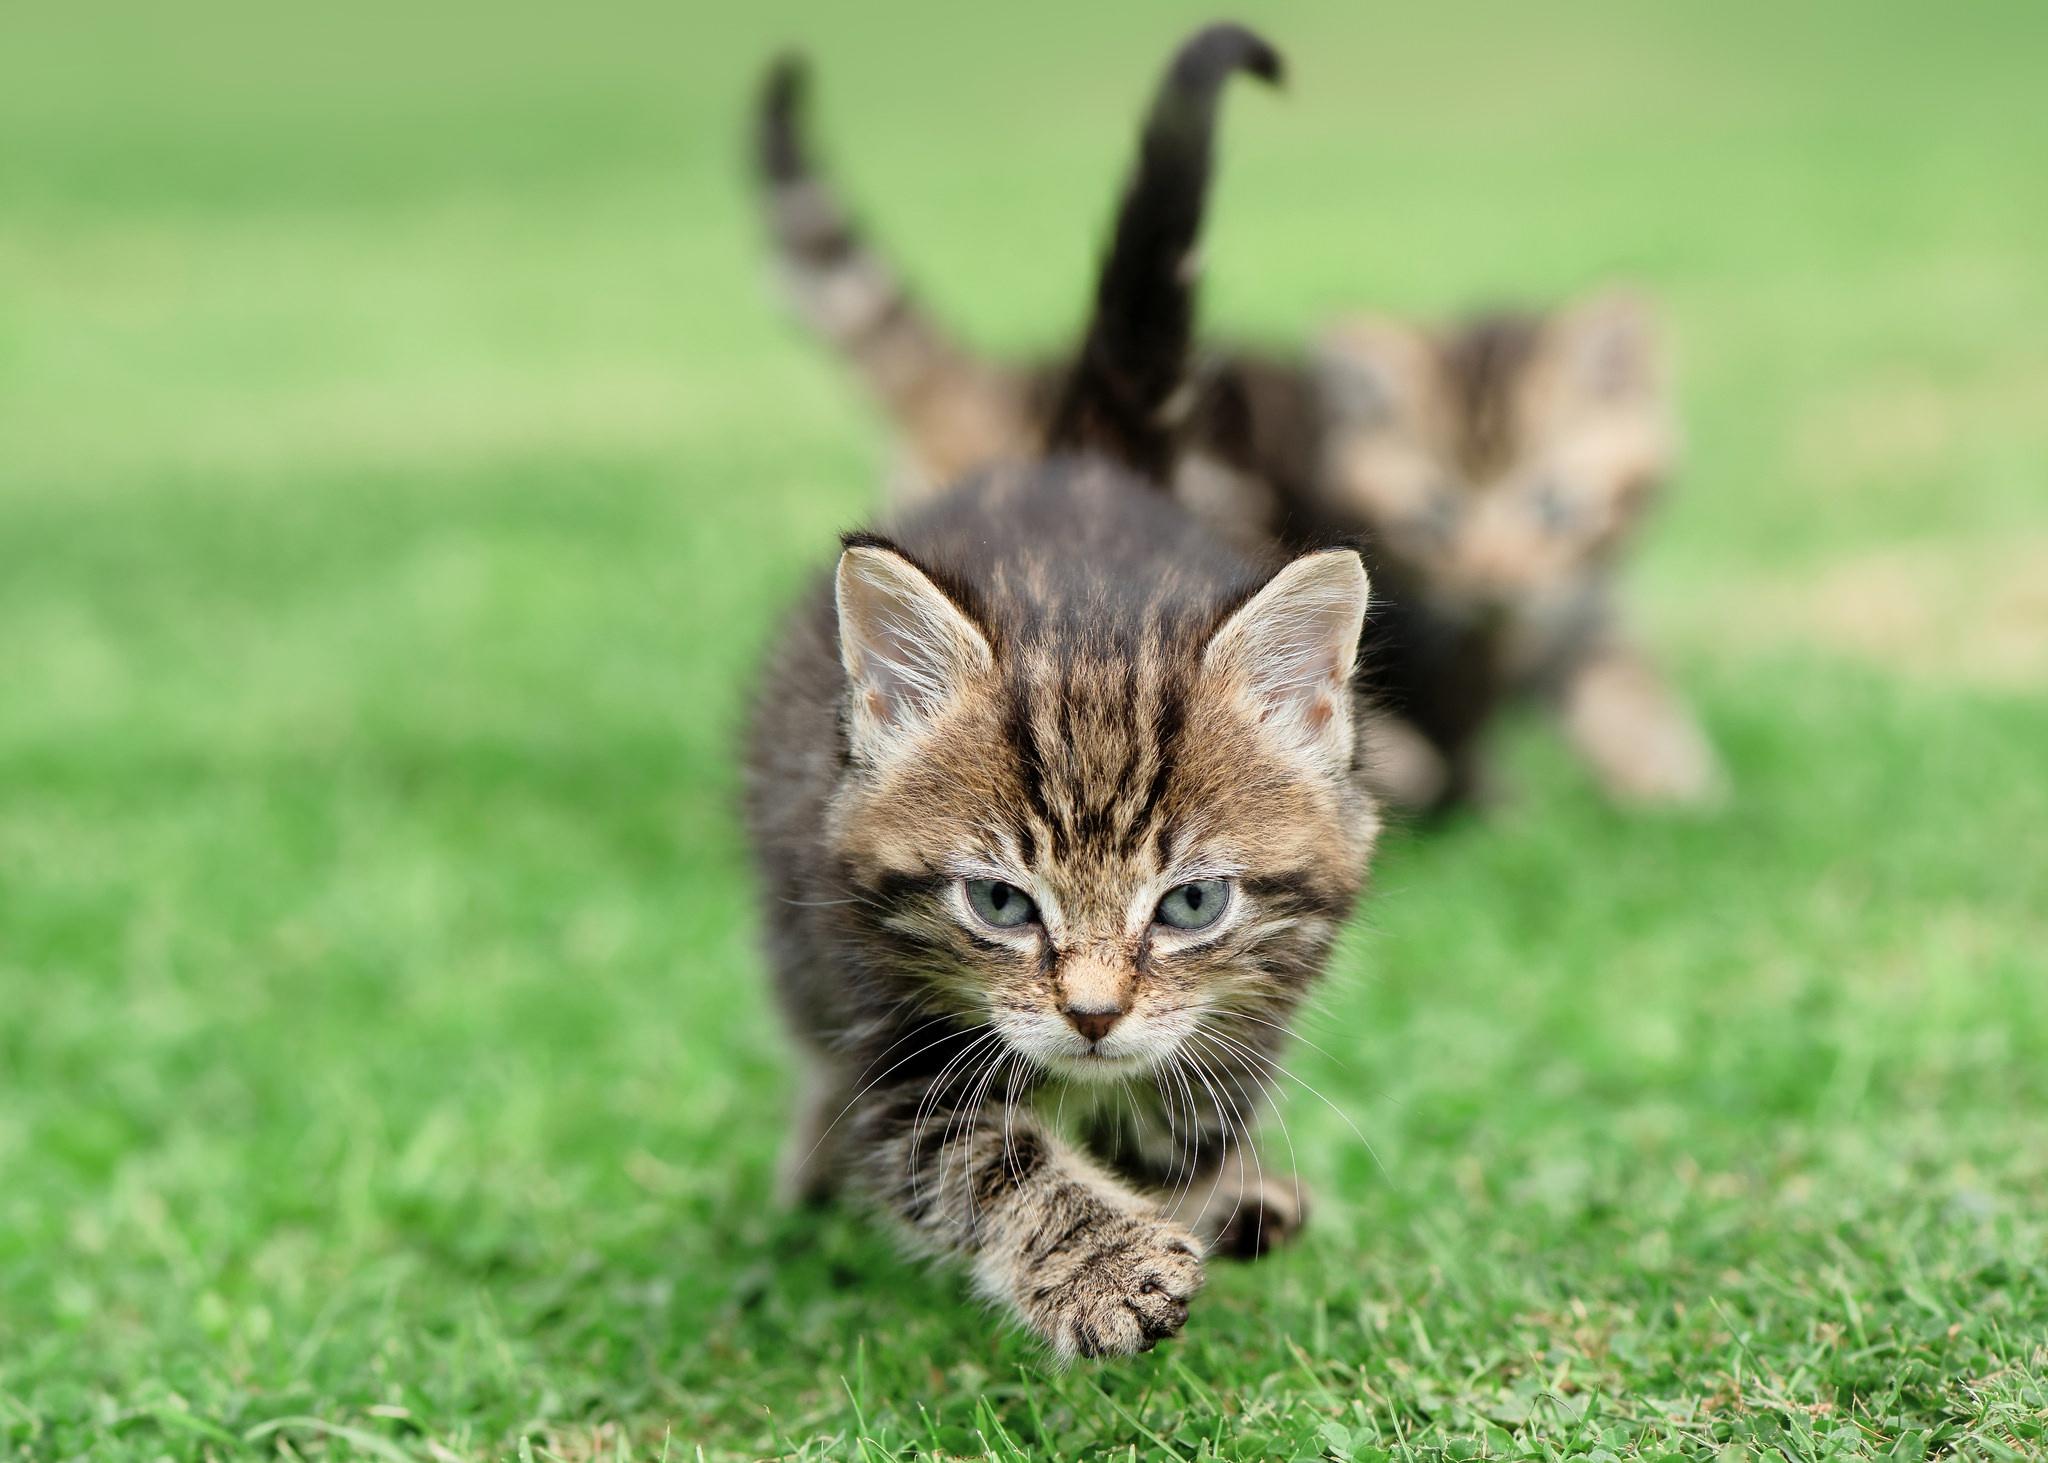 Baby Animal Cat Kitten Pet 2048x1463